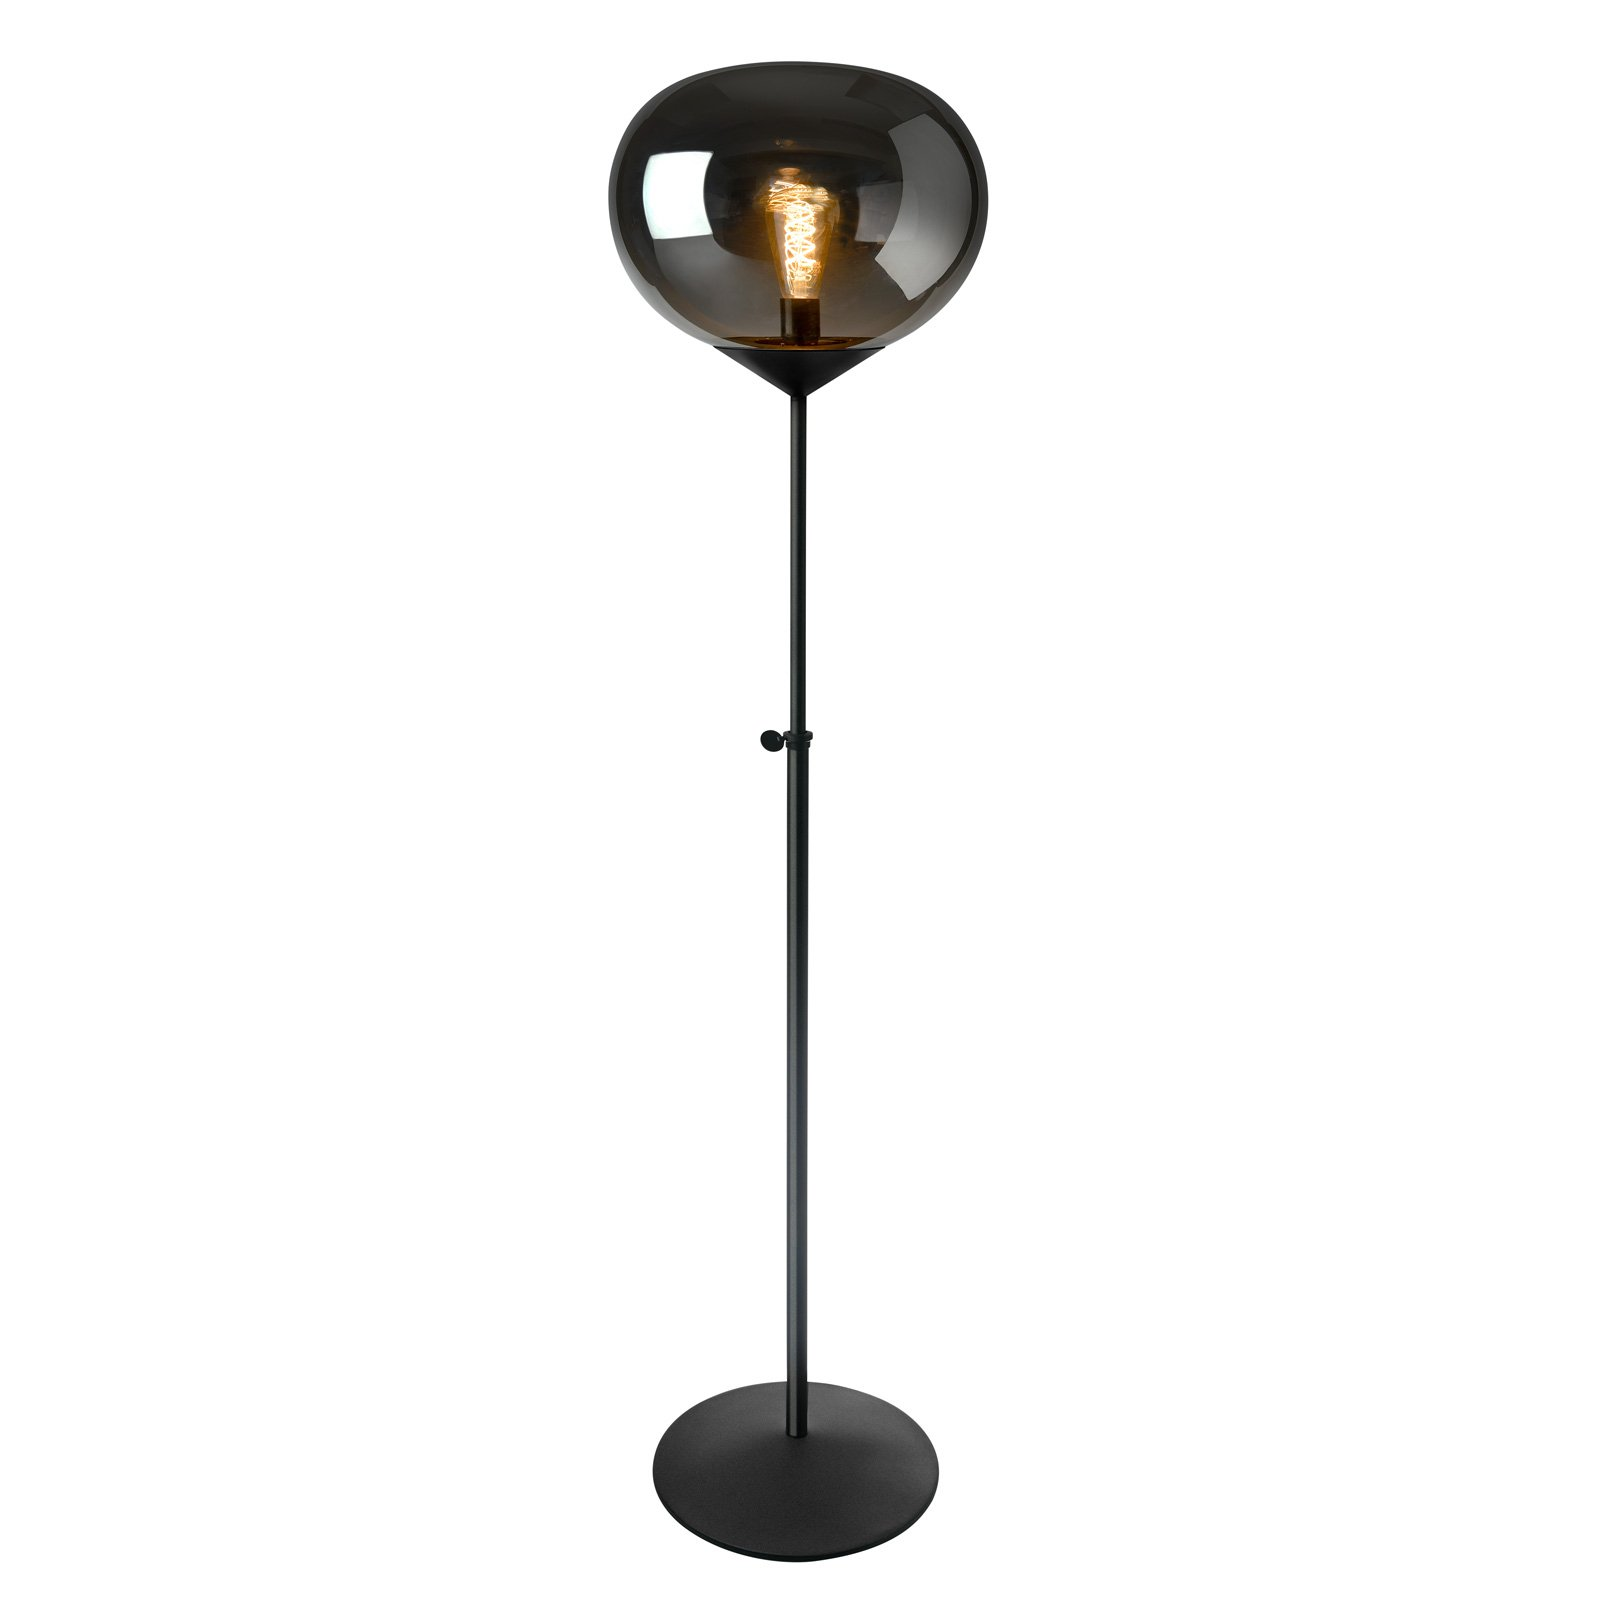 Gulvlampe Drop, røyklass, justerbar høyde